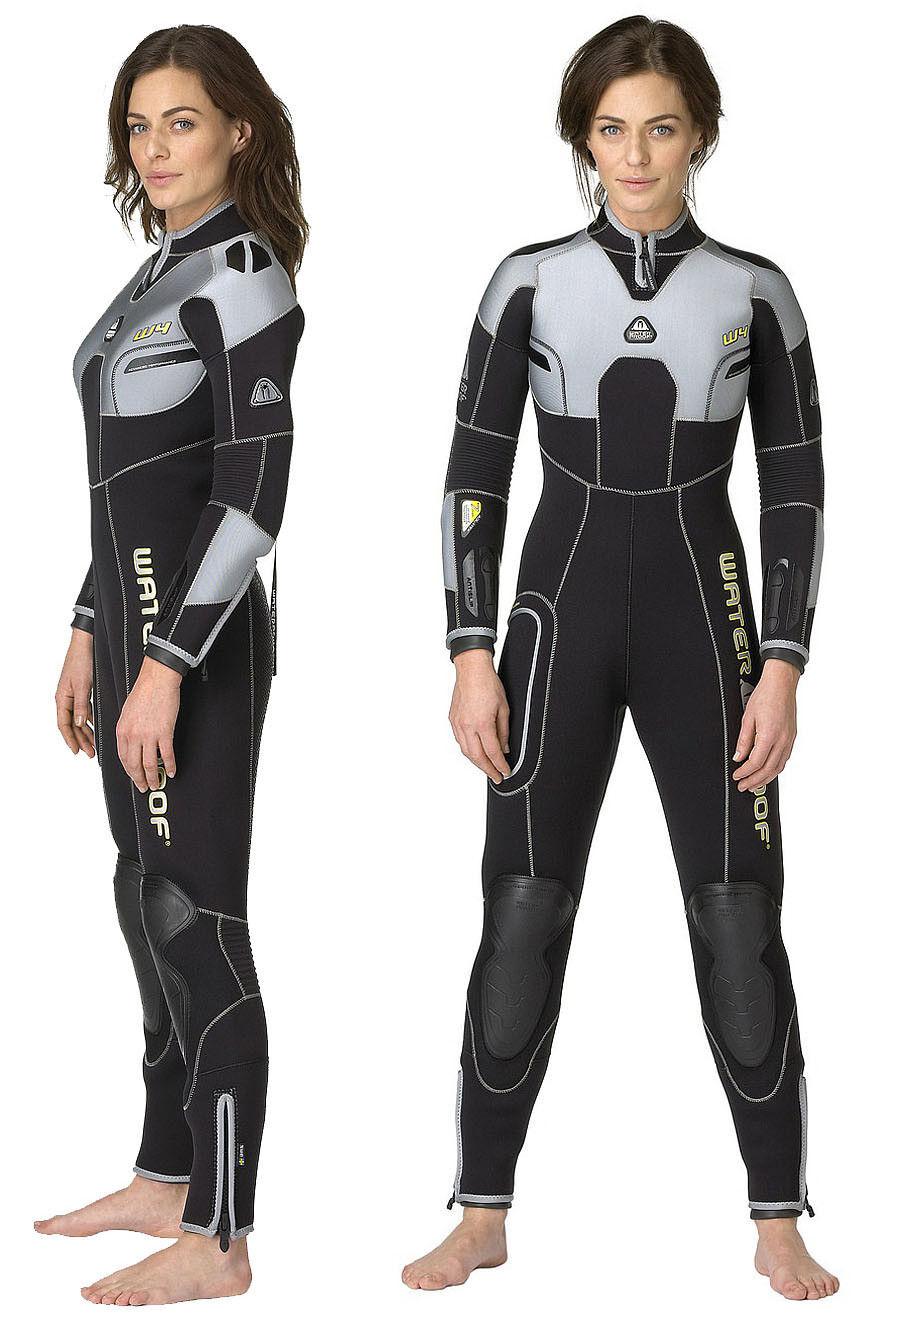 WATERPROOF W4 Ladies 7mm MICRO CELL Neoprene Scuba Diving Semi Dry Wetsuit -